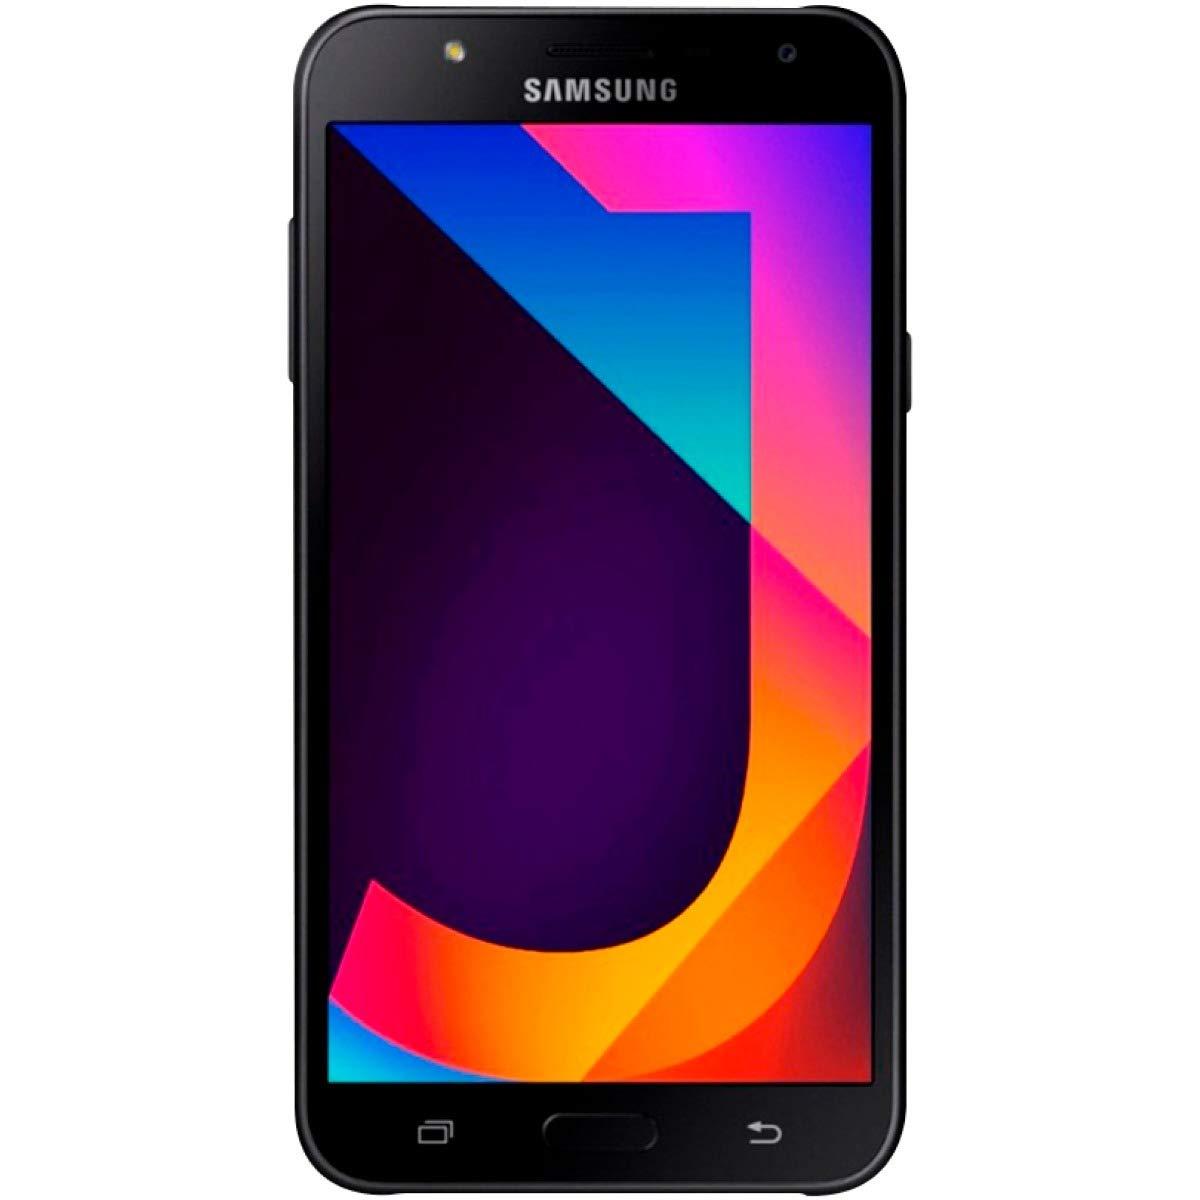 Samsung Galaxy J7 Neo 16gb J701m Ds 55 Android Lcd Grand Plus Oem 70 Dual Sim Unlocked Smartphone International Model Black Cell Phones Accessories